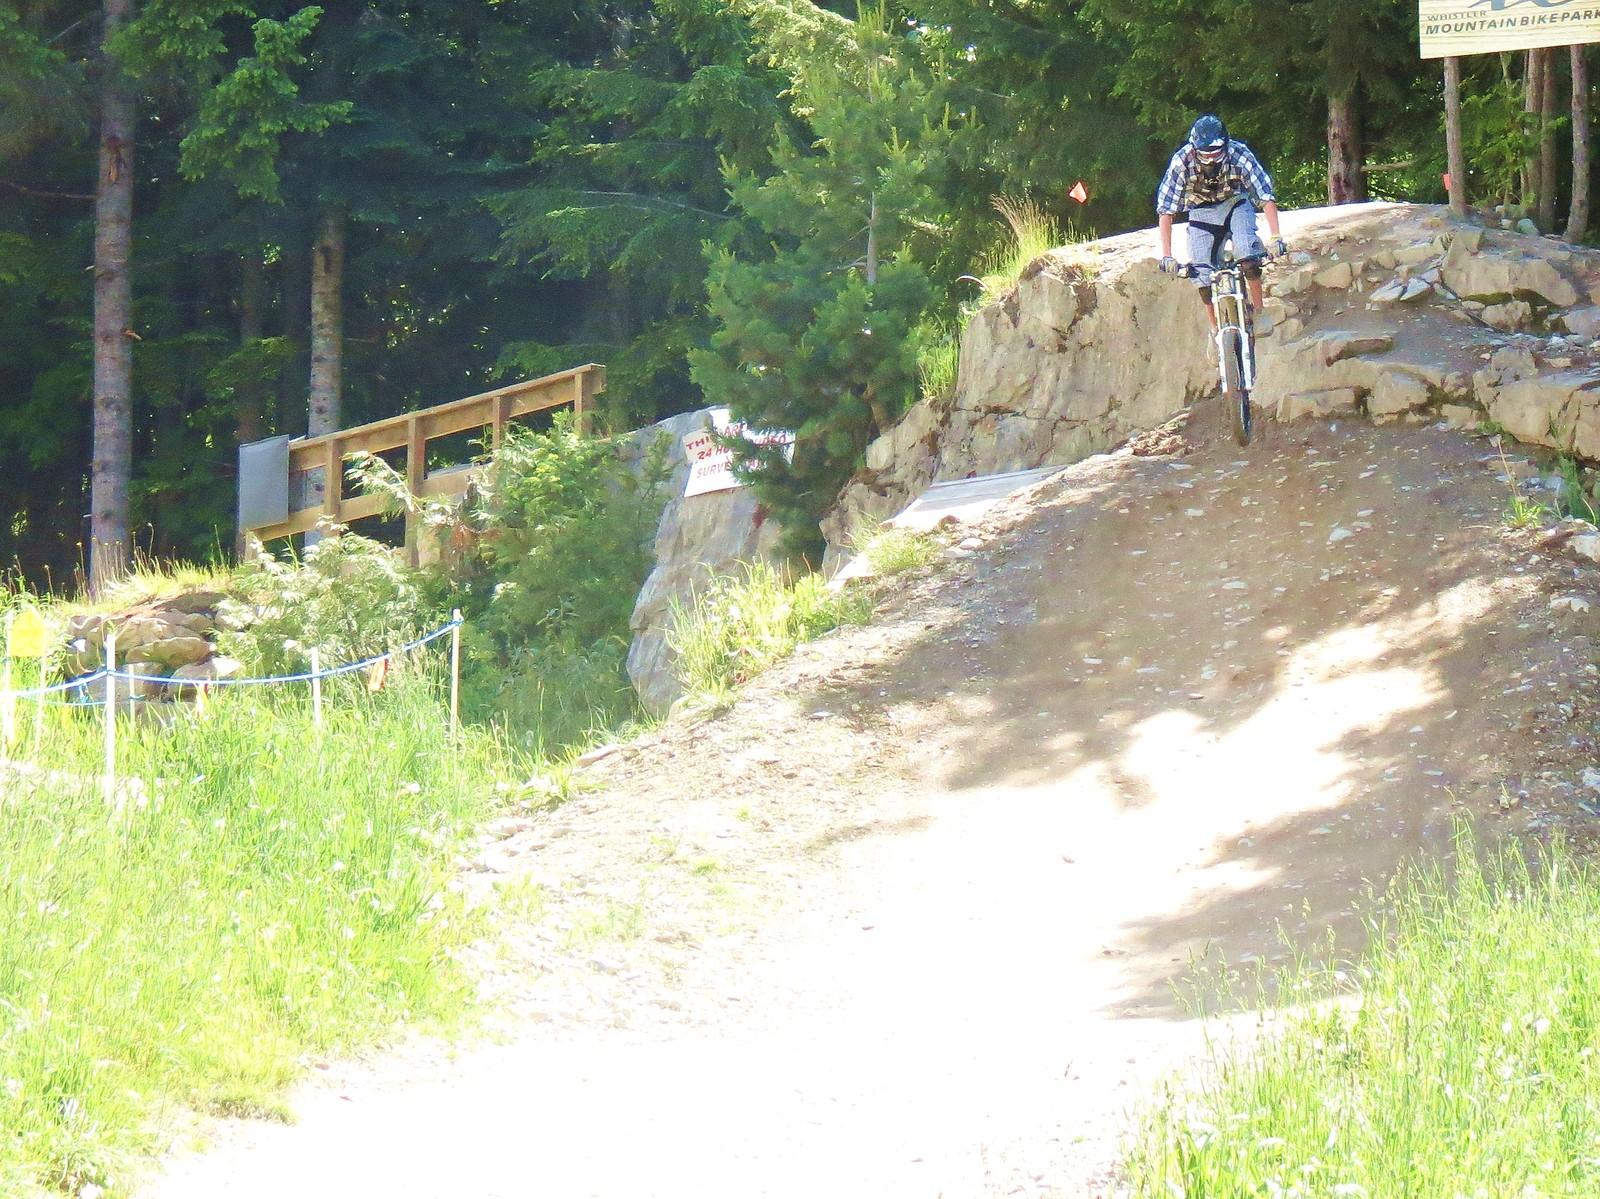 IMG 3524 (2) - Moosey - Mountain Biking Pictures - Vital MTB